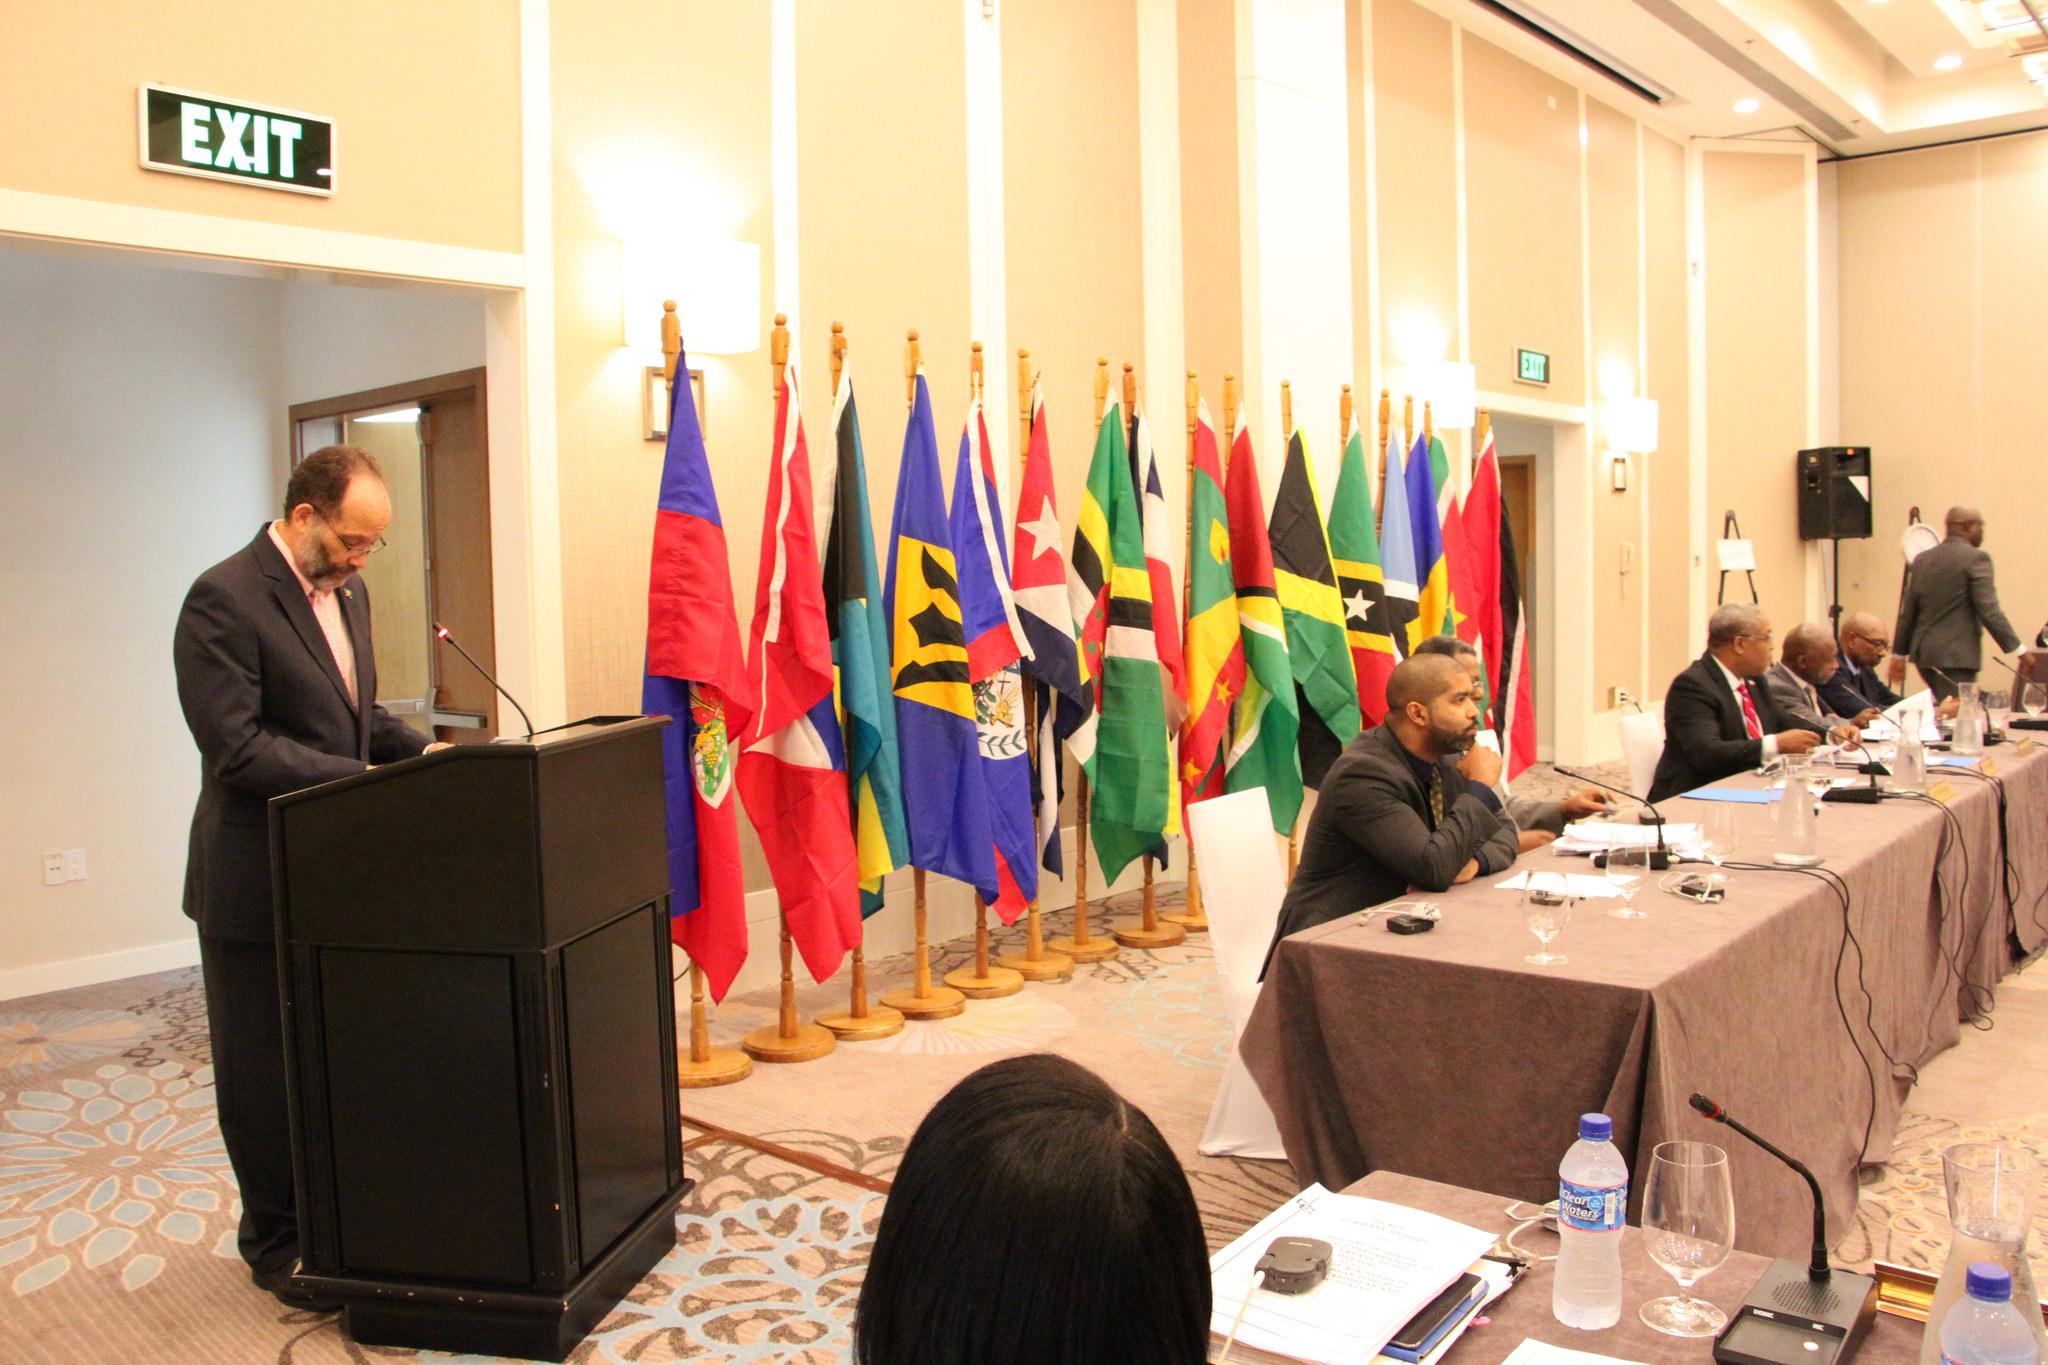 Ambassador Irwin LaRocque, Secretary-General of CARICOM and CARIFORUM, addresses the meeting at the Marriott Hotel, Georgetown, Guyana, 17 March, 2016